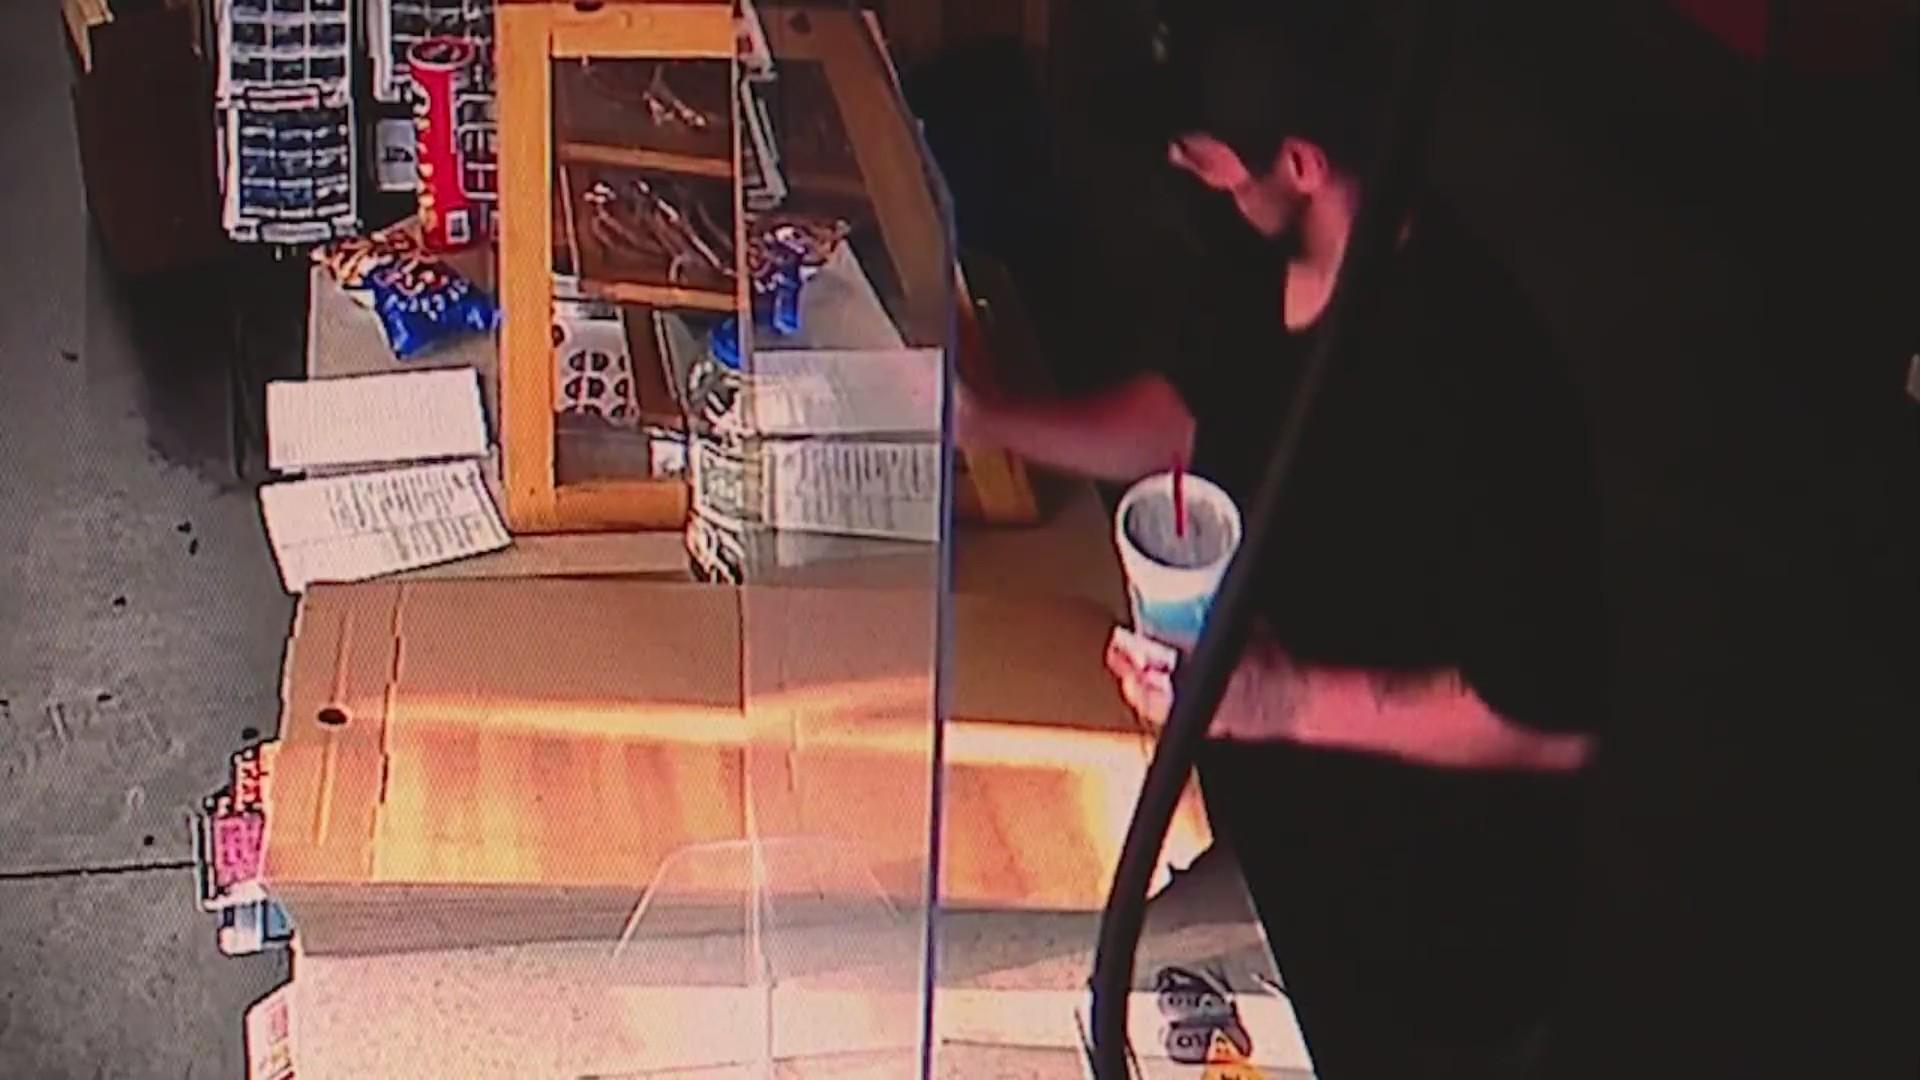 donation jar thief